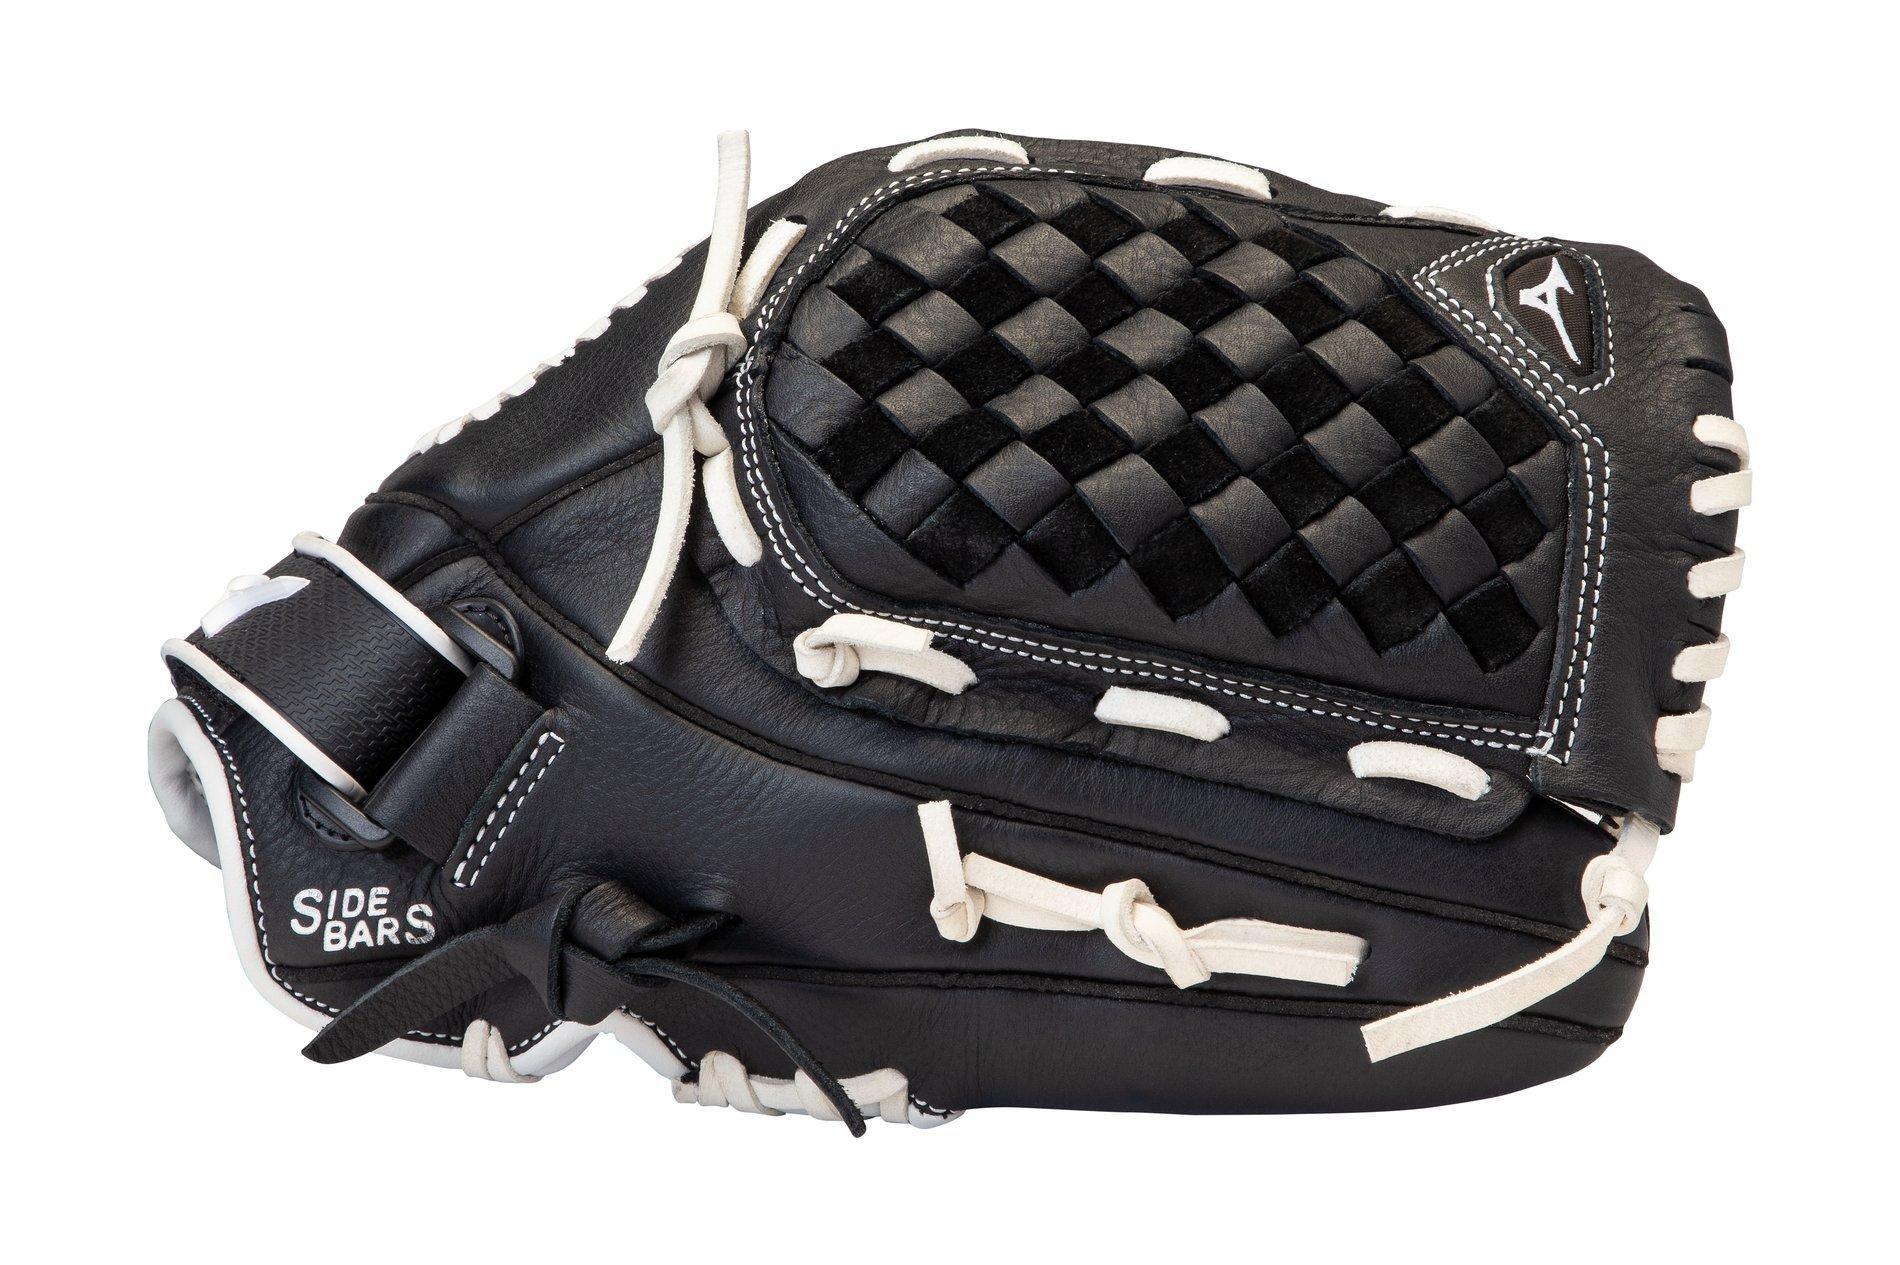 Mizuno Prospect 12 Softball Glove Fast Pitch Black